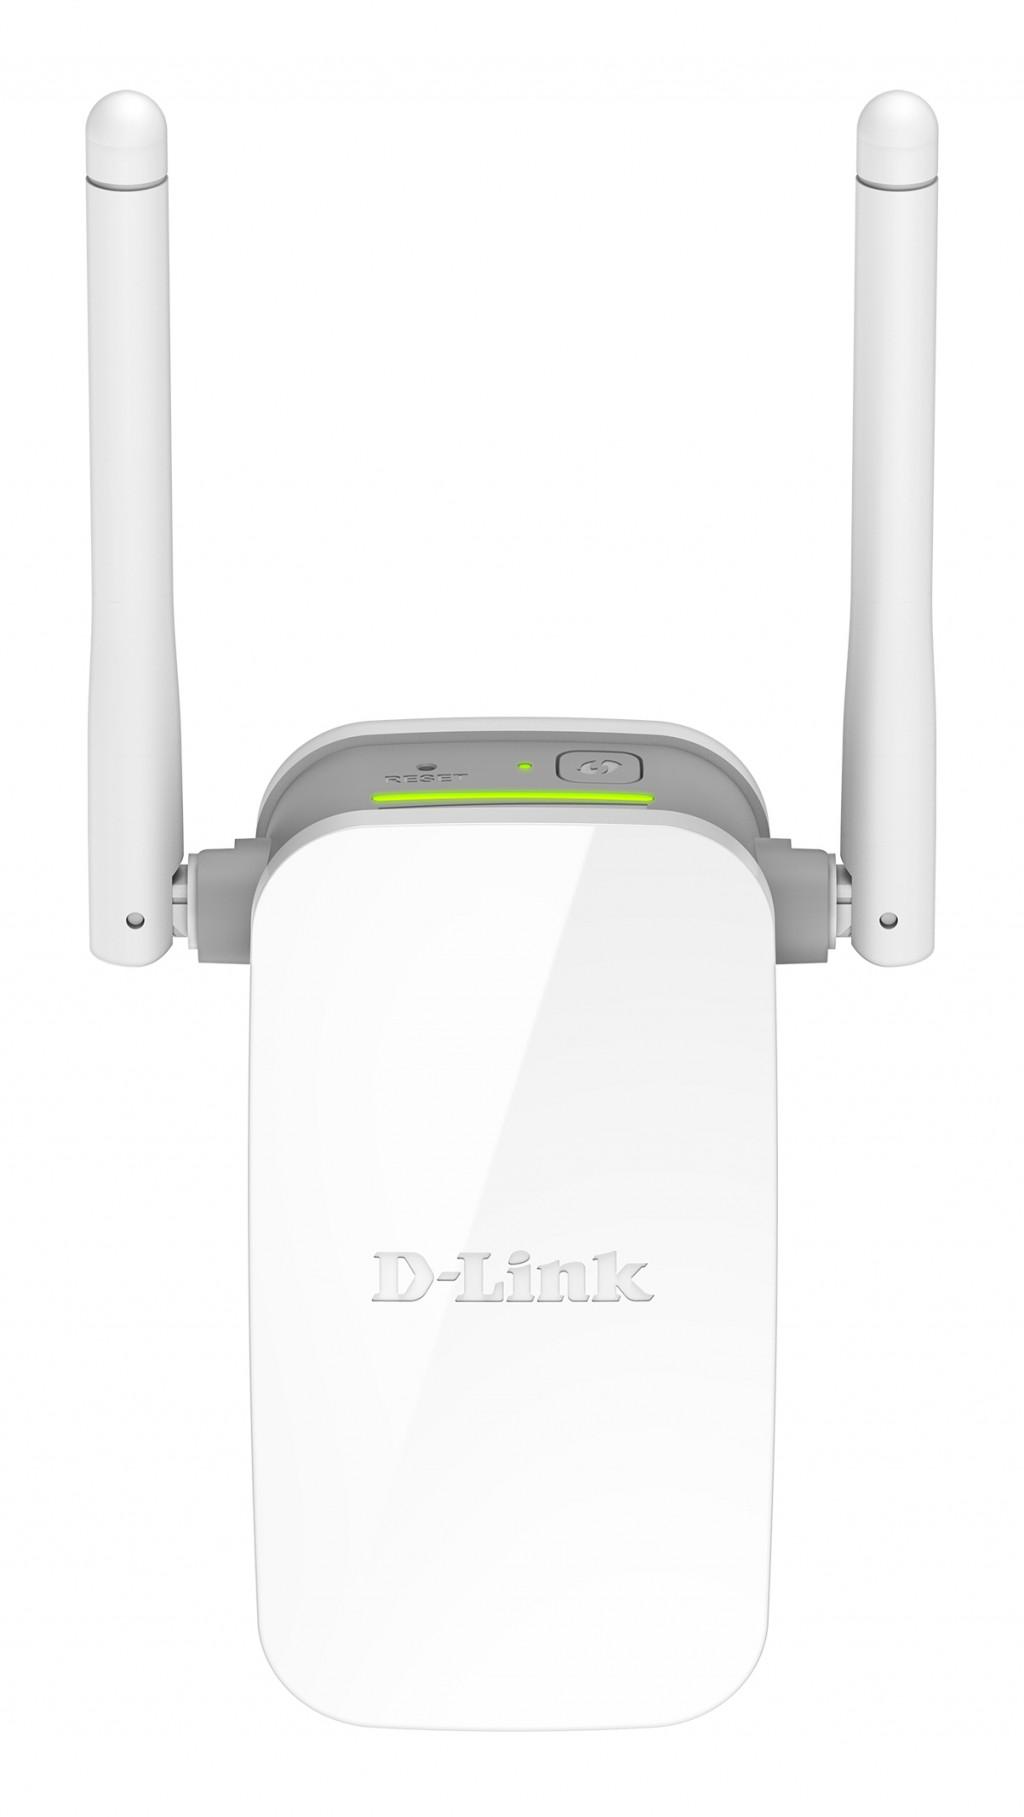 D-Link Extender DAP-1325 802.11n, 2.4GHz, 300 Mbit/s, 10/100 Mbit/s, Ethernet LAN (RJ-45) ports 1, Antenna type 2xExternal 2 dBi